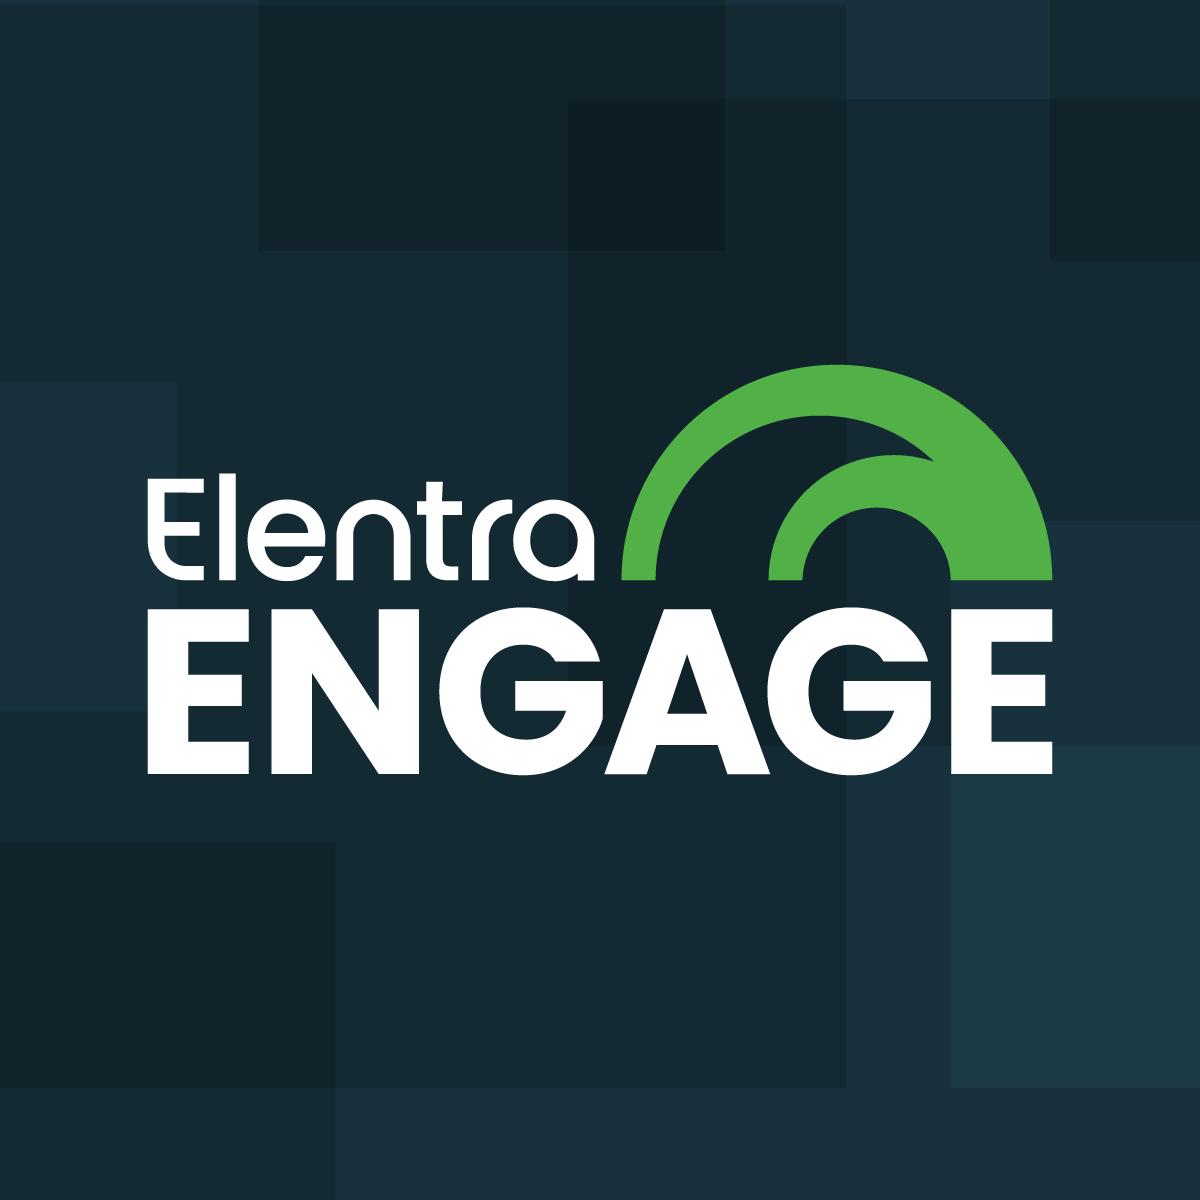 Elentra Engage Graphic